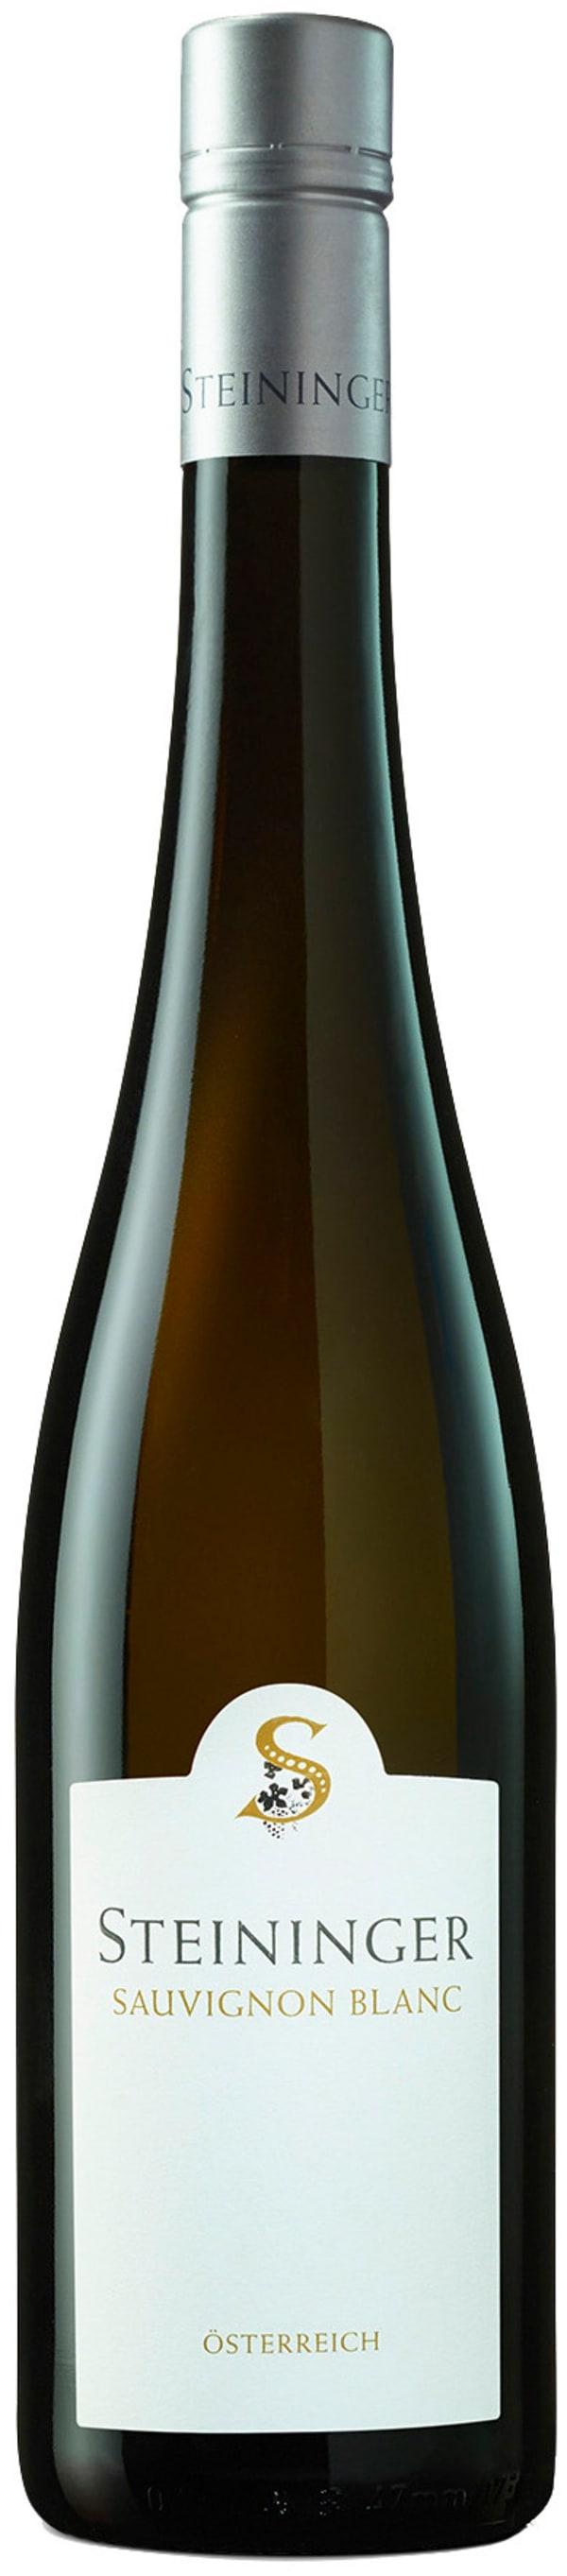 Steininger Sauvignon Blanc 2018